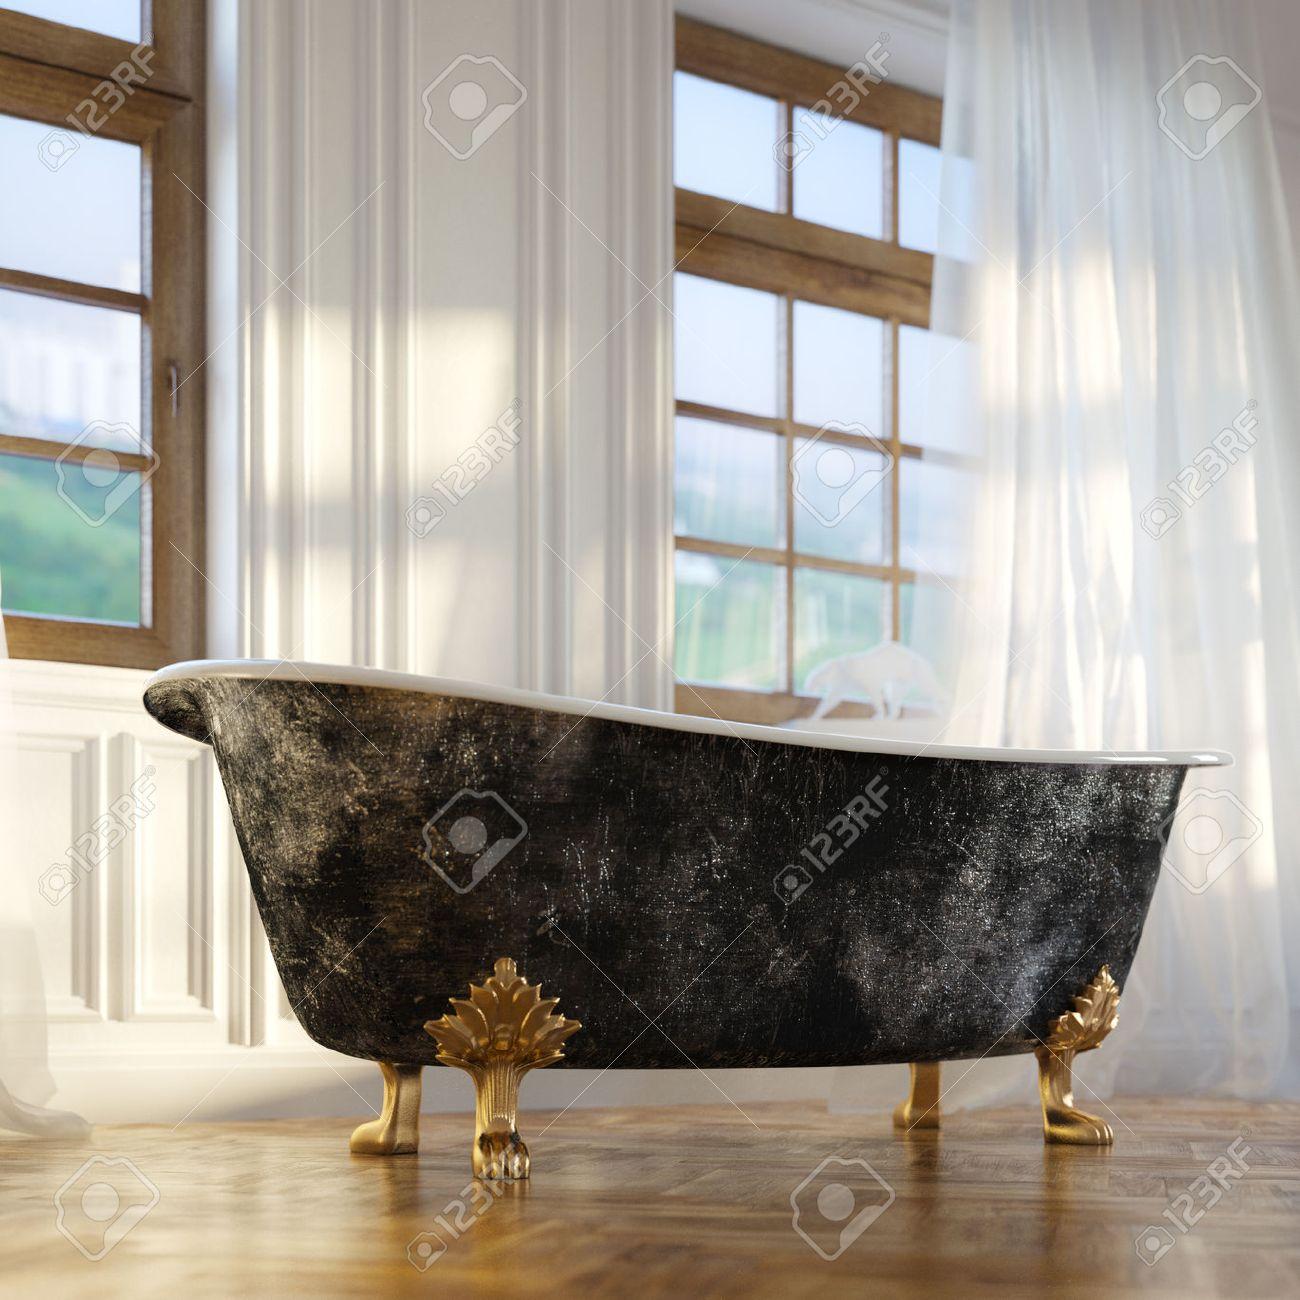 Luxury Retro Bathtub In Modern Room Interior 2d Version